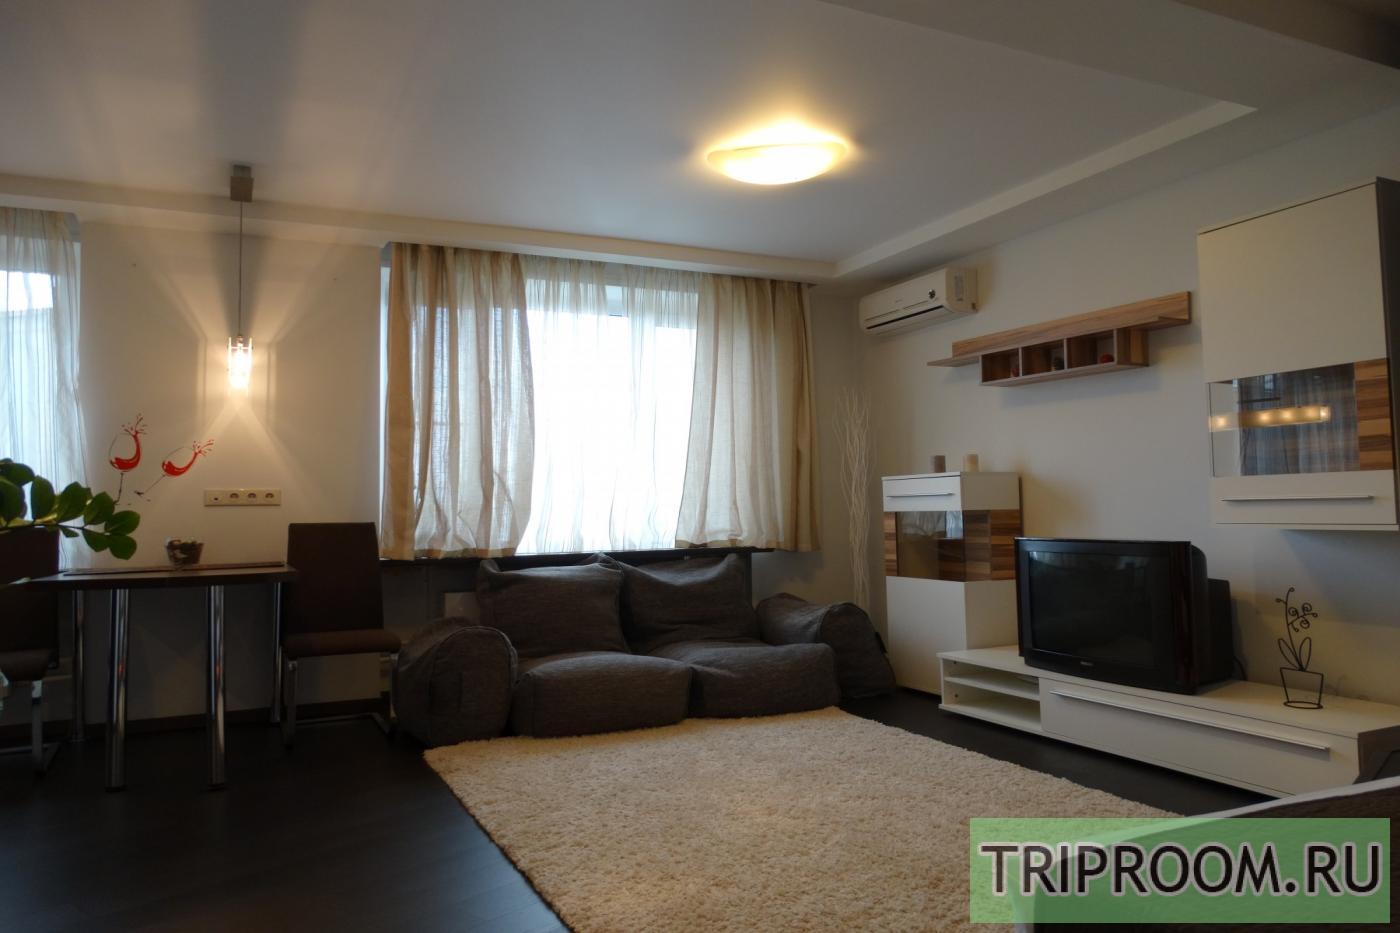 1-комнатная квартира посуточно (вариант № 22157), ул. Архитектора Власова улица, фото № 6